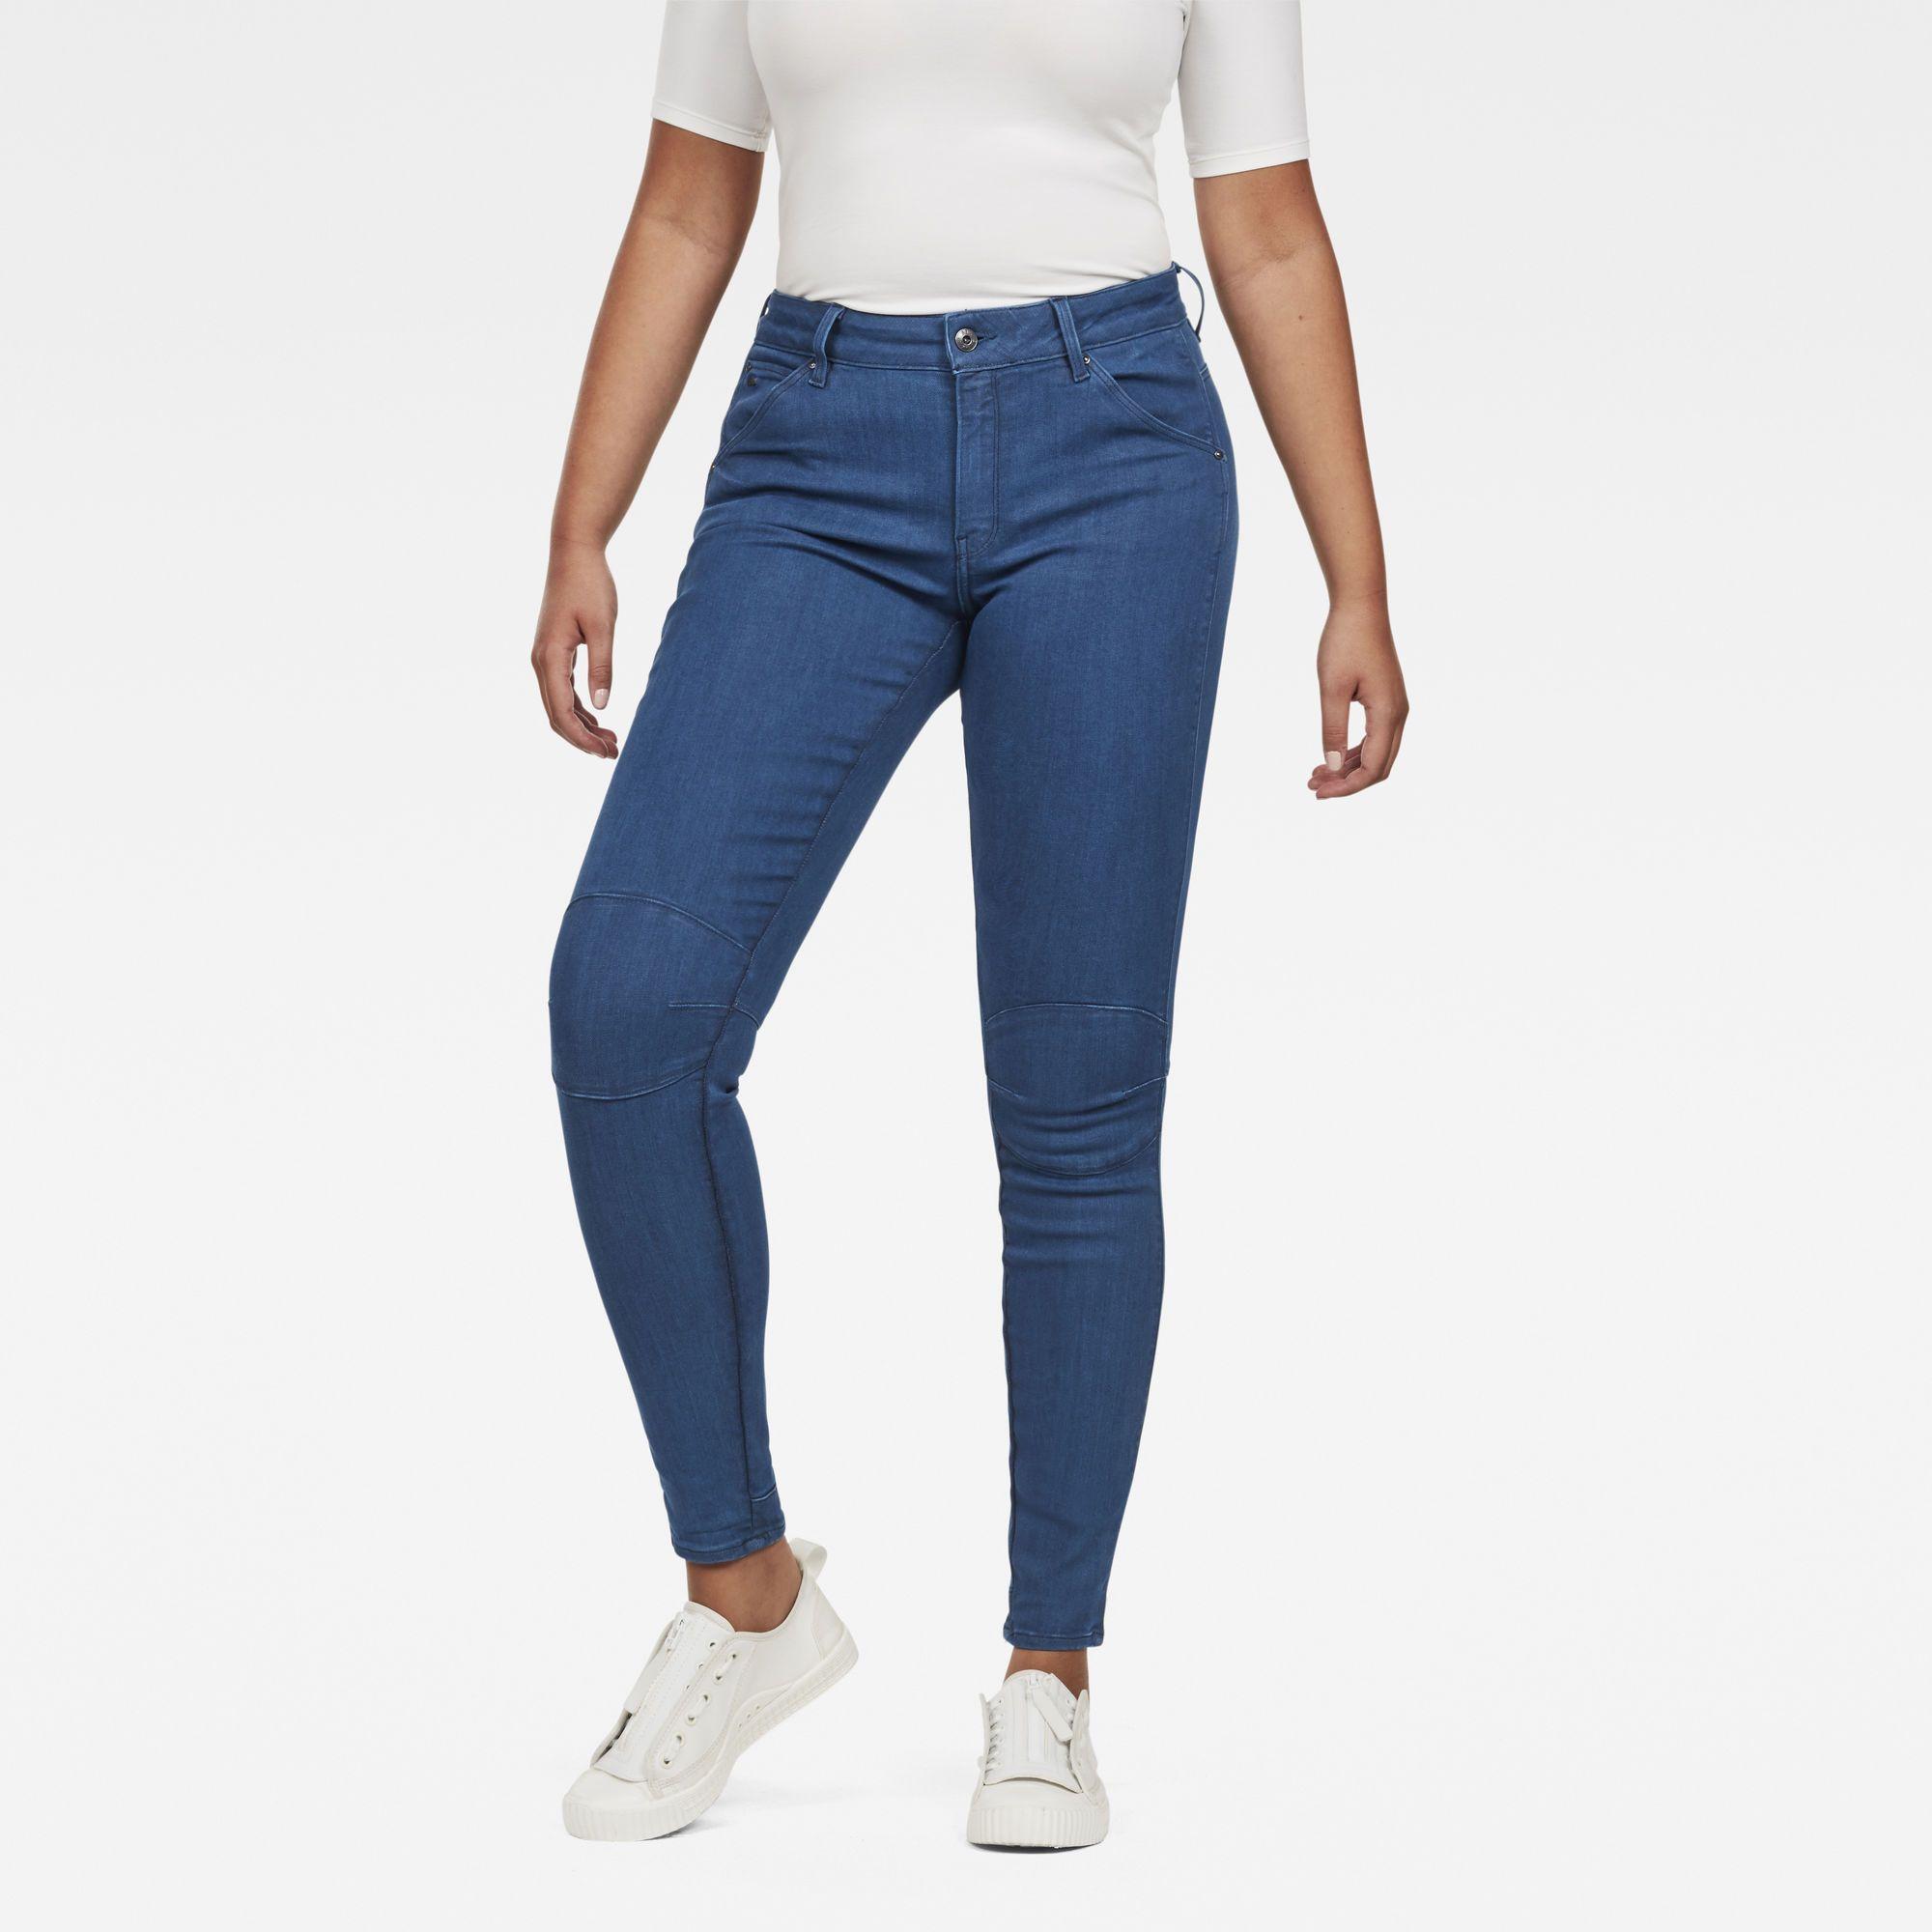 G-Star RAW 5622 G-Star Shape High Waist Super Skinny Jeans